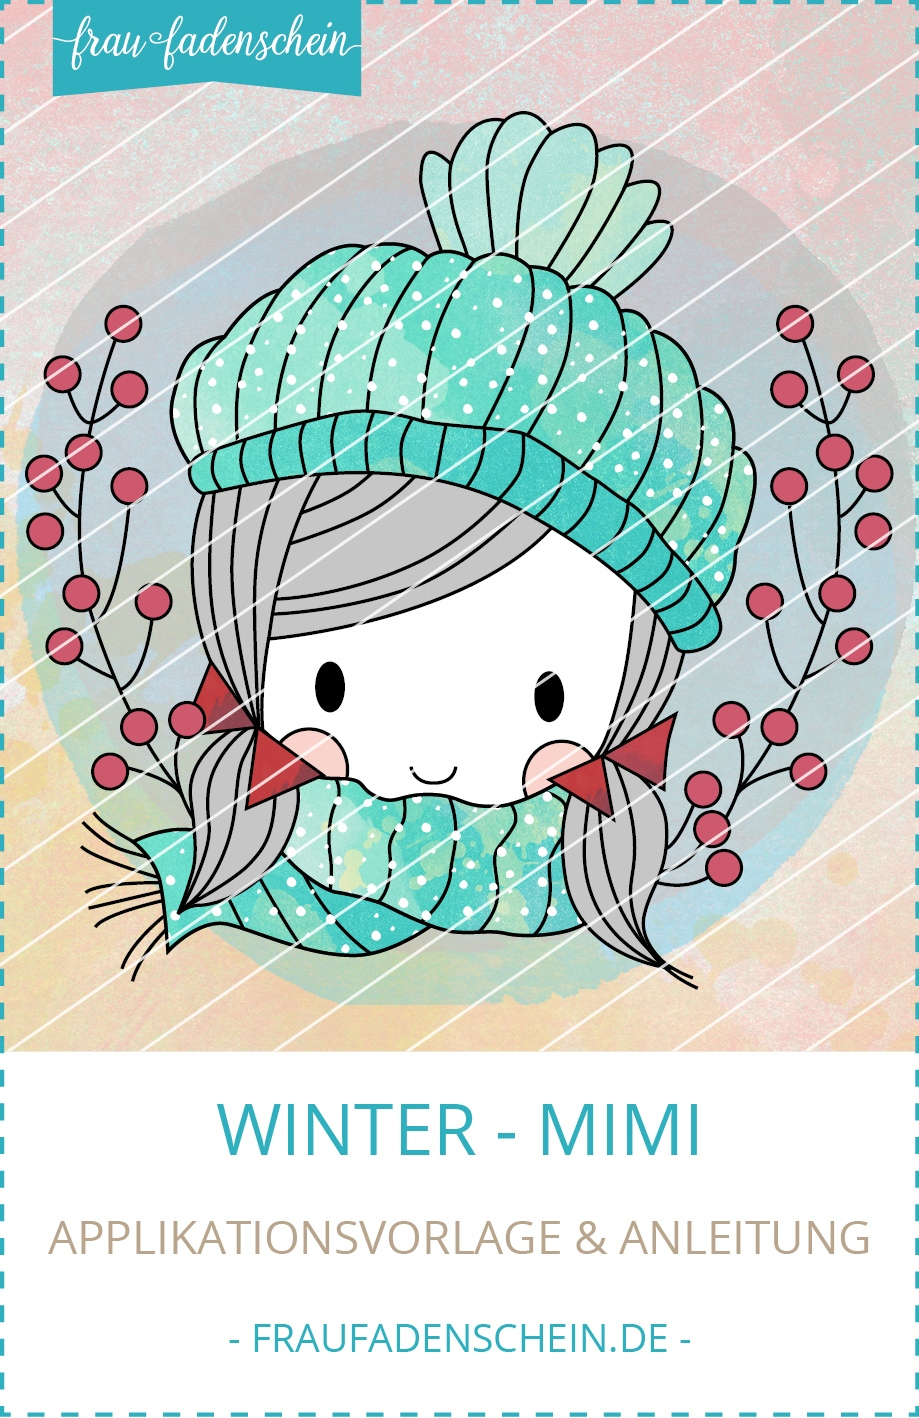 Applikationsvorlage Winter-Mimi